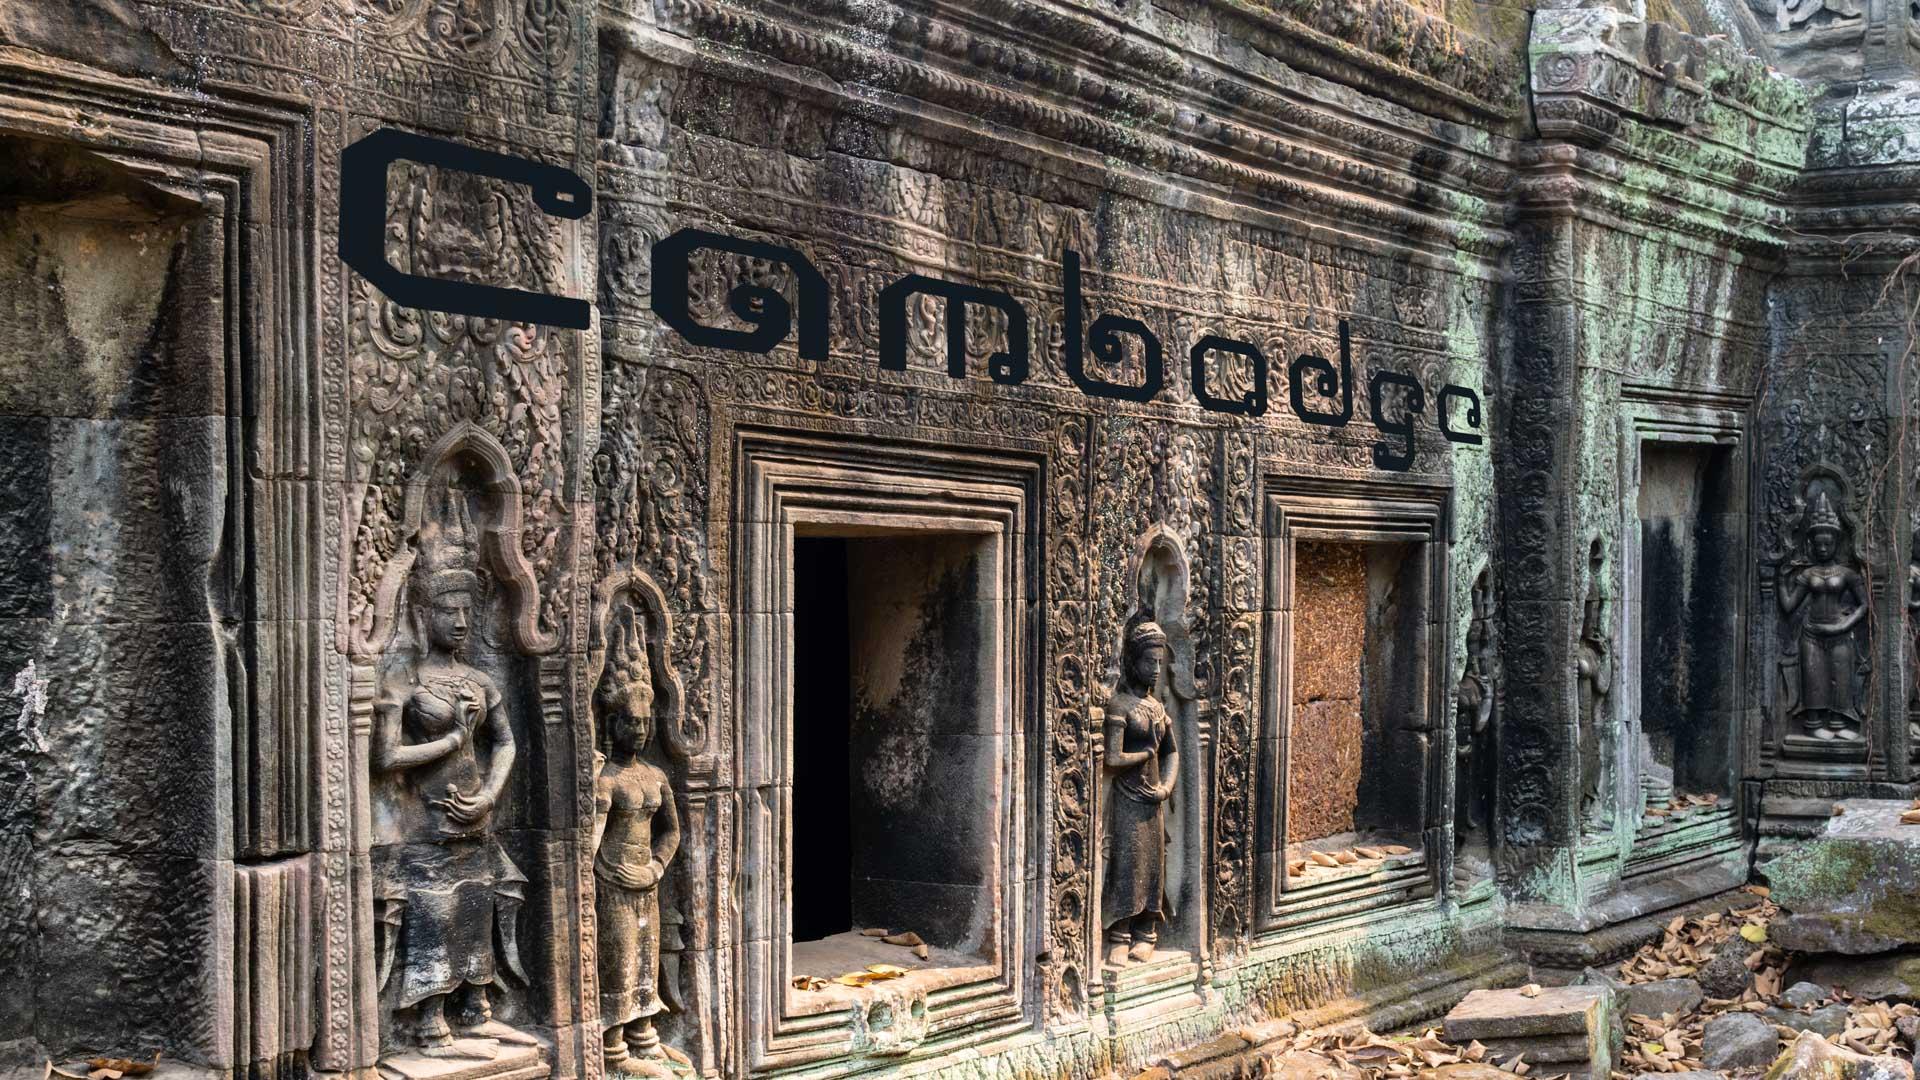 SerialHikers stop autostop world monde tour hitchhiking aventure adventure alternative travel voyage sans avion no fly cambodge cambodia guide